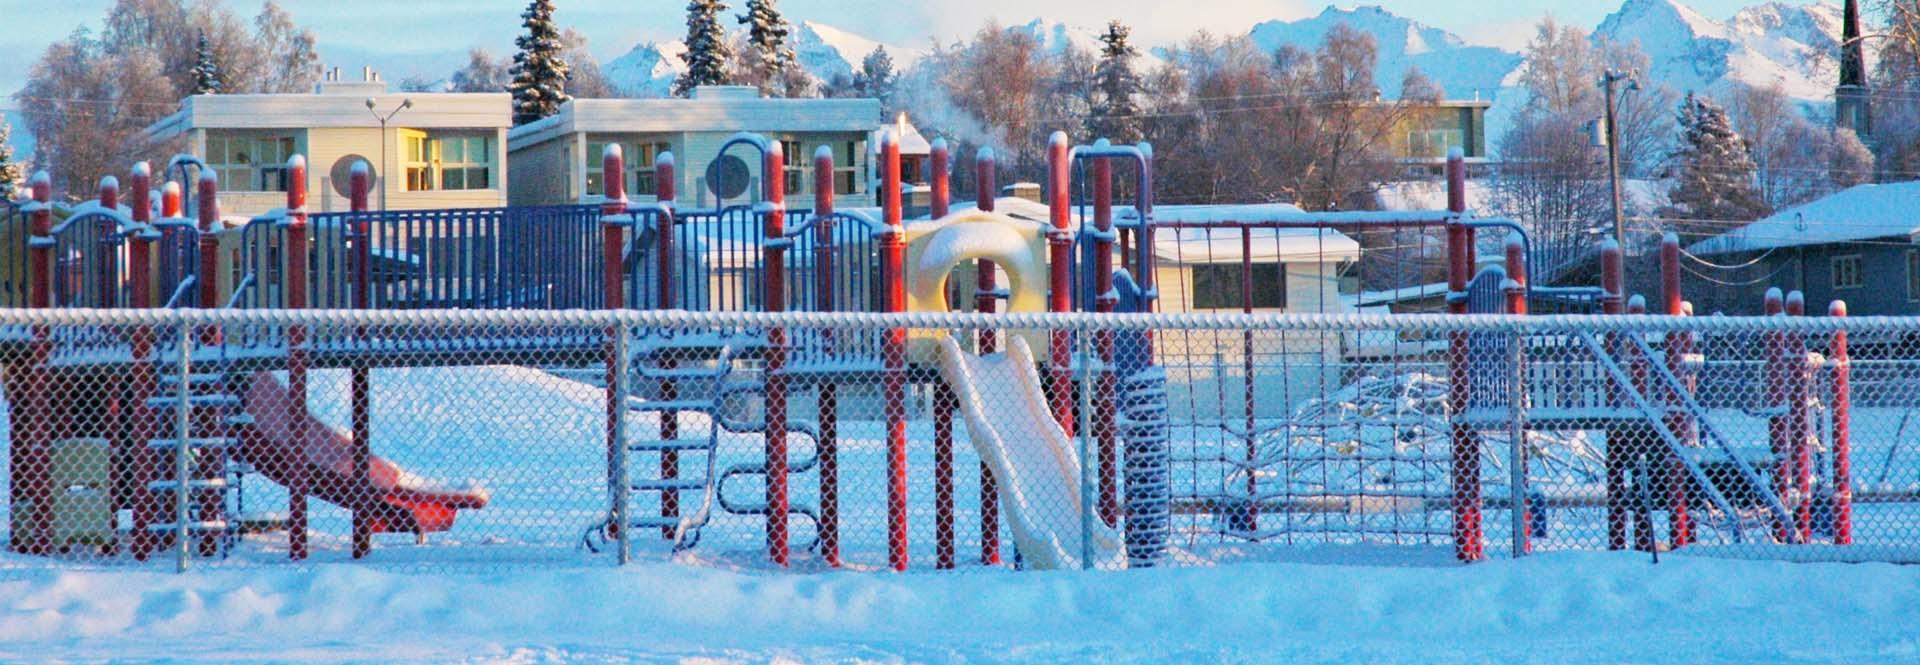 maintenance of school surfaces - slider